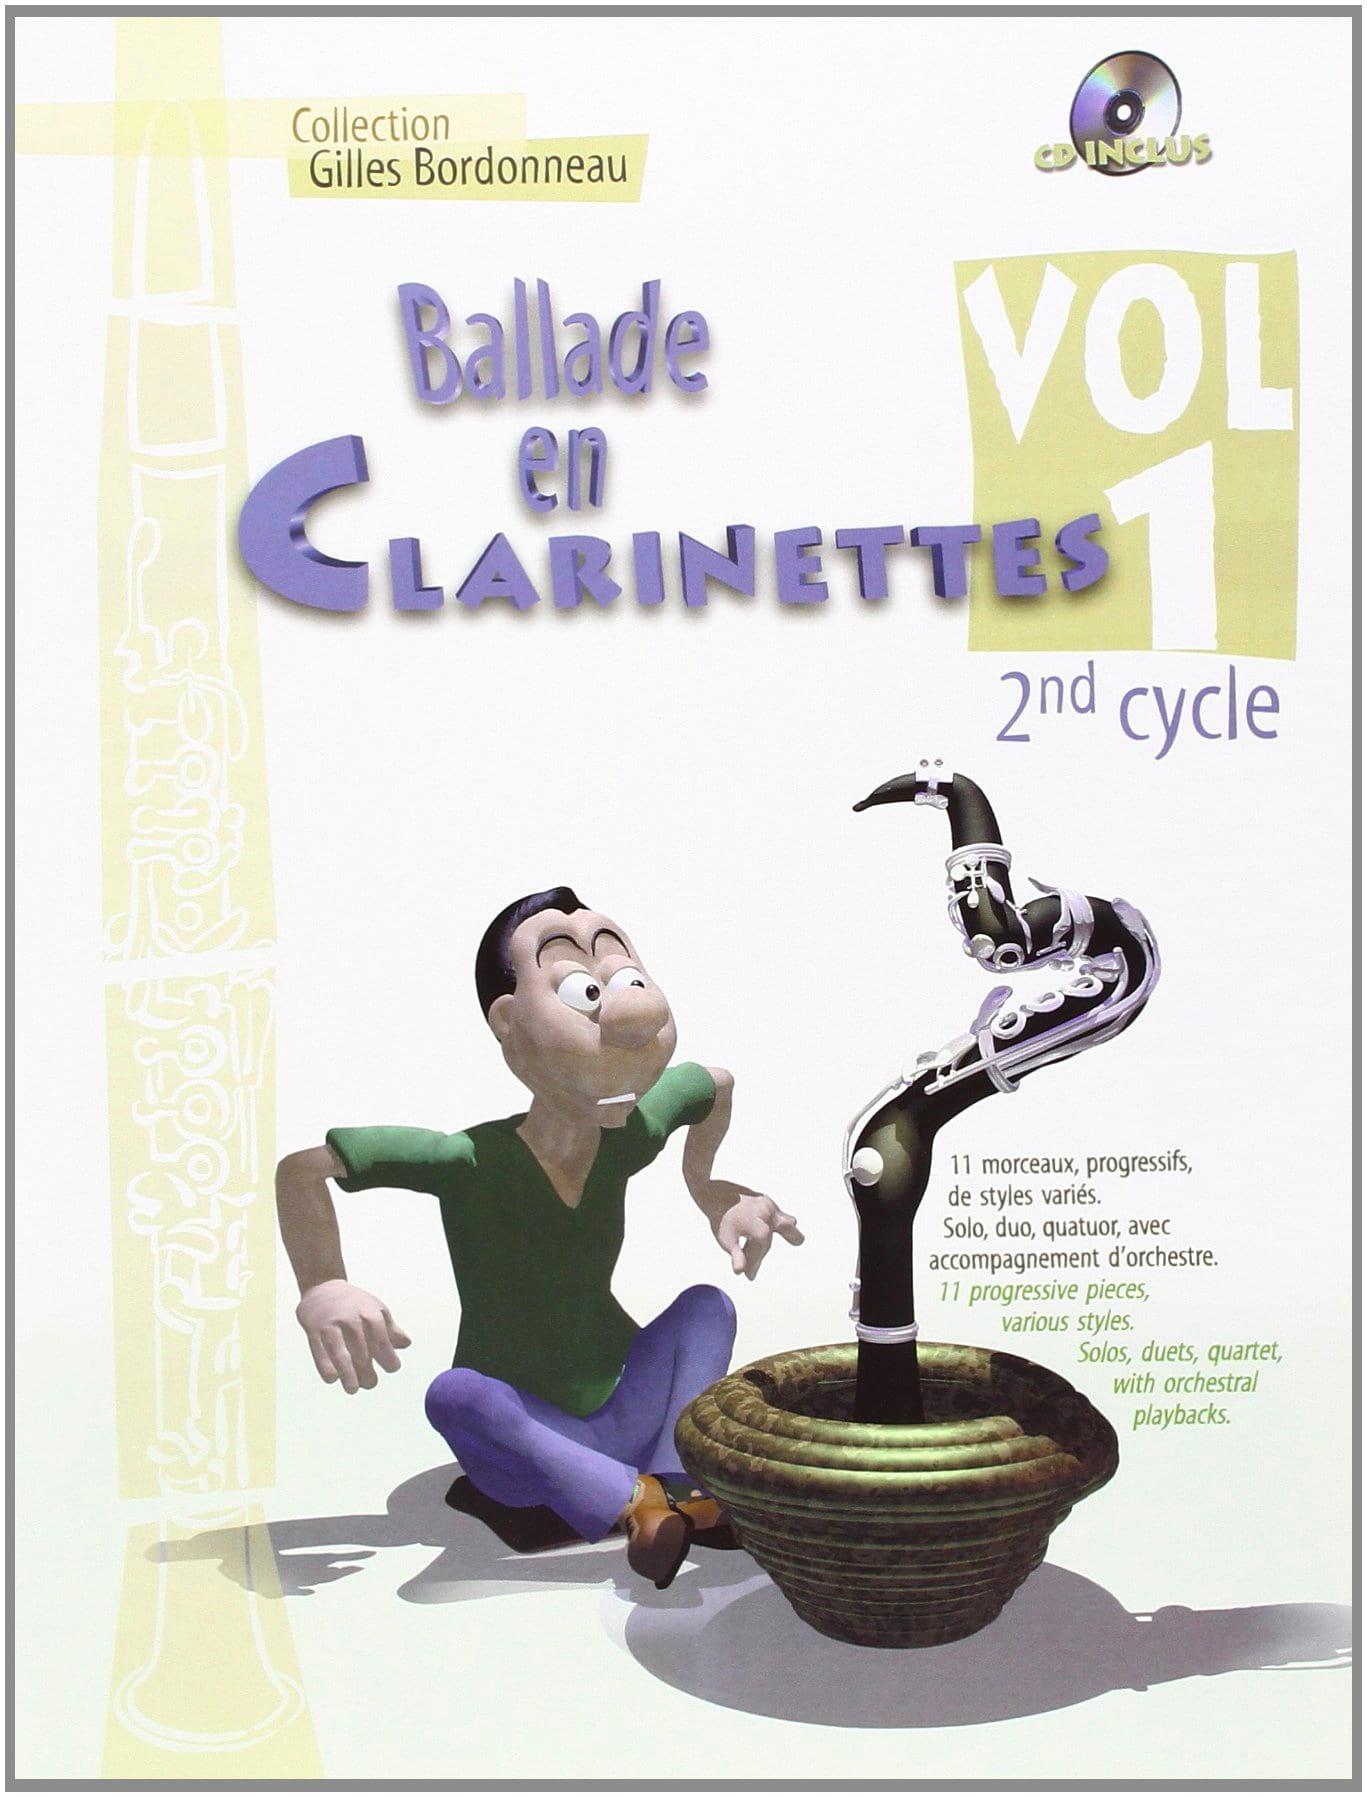 Ballade en clarinettes - Volume 1 Cycle 2 - laflutedepan.be